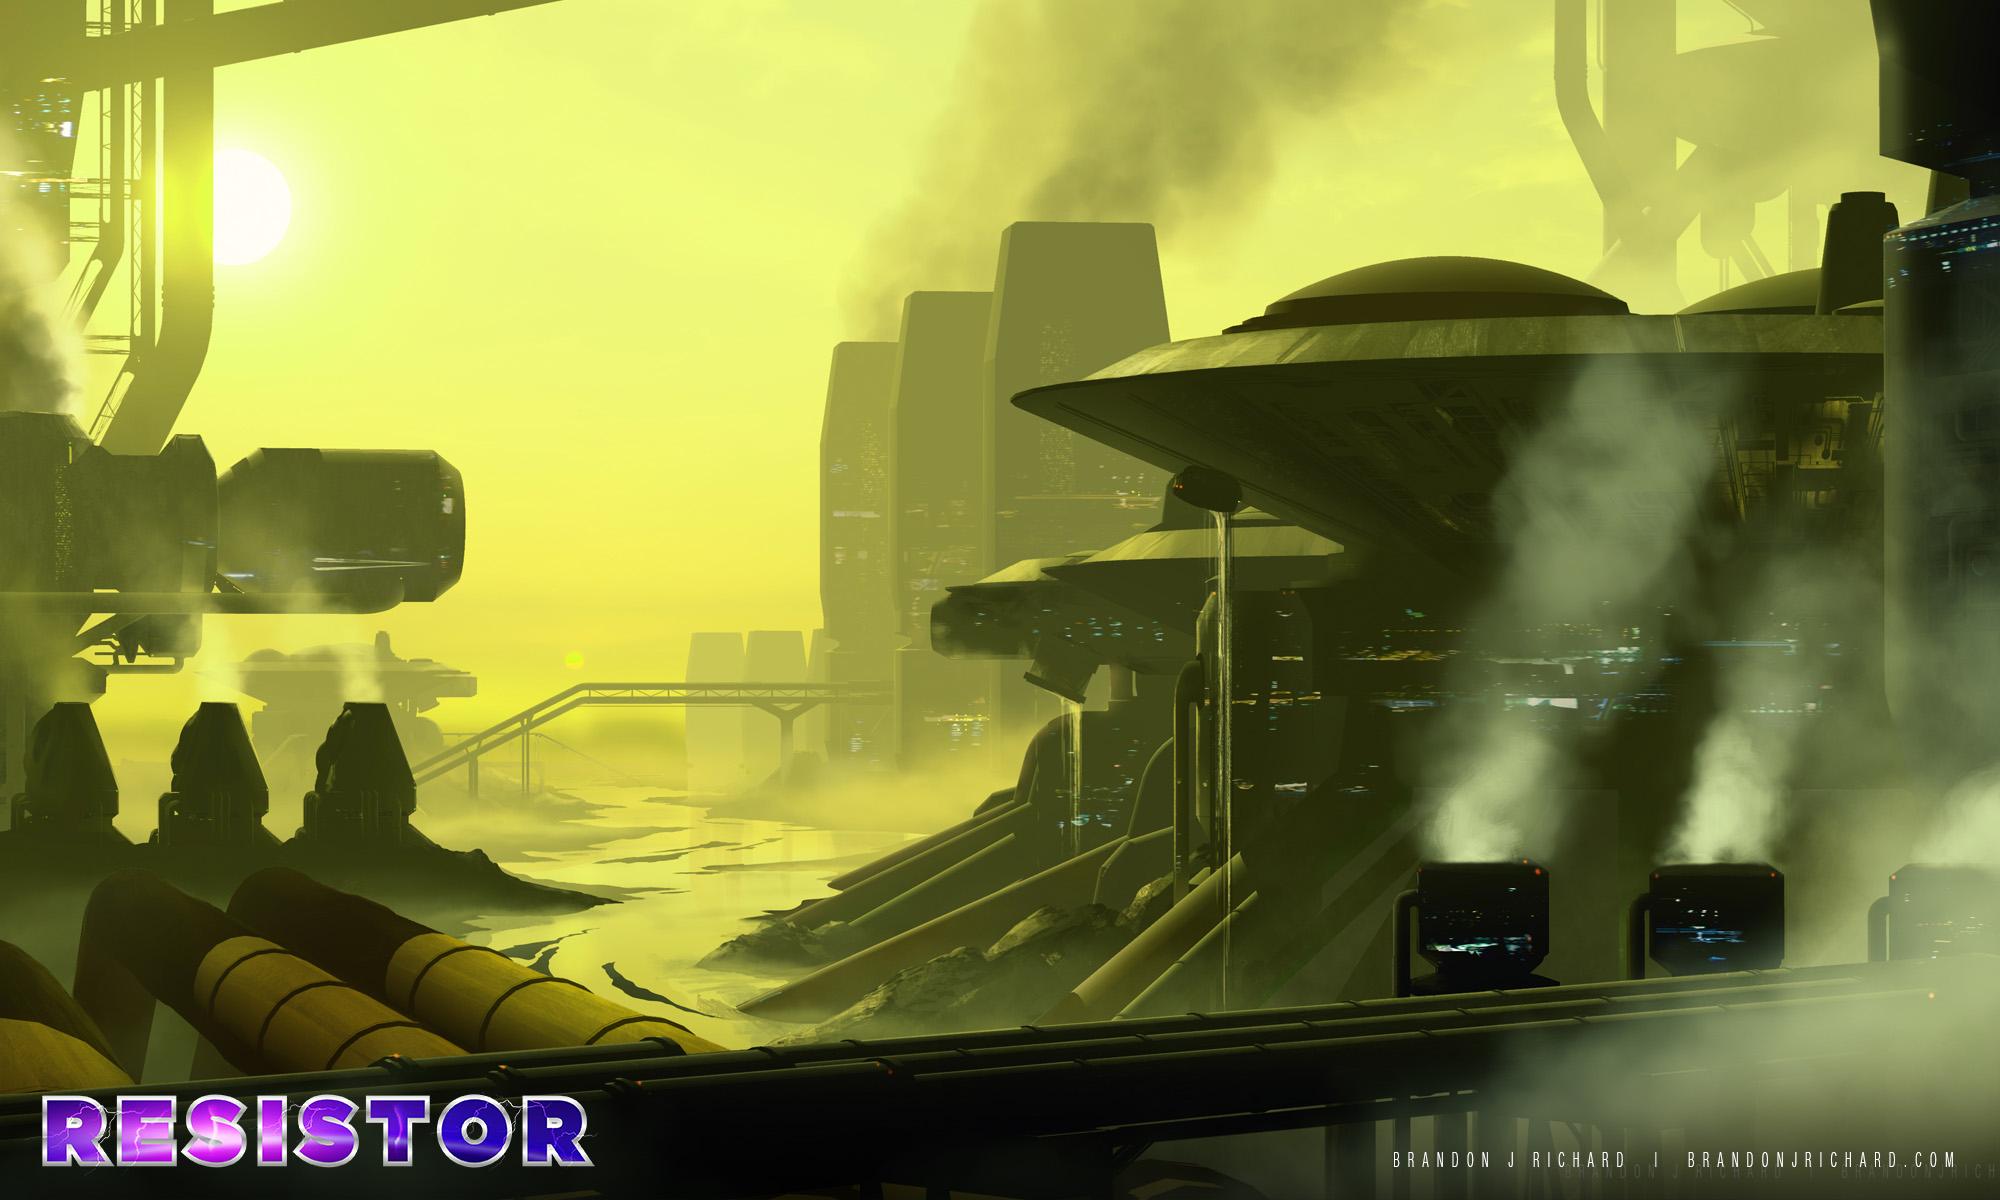 Resistor Toxic Wasteland Brandon J Richard.jpg